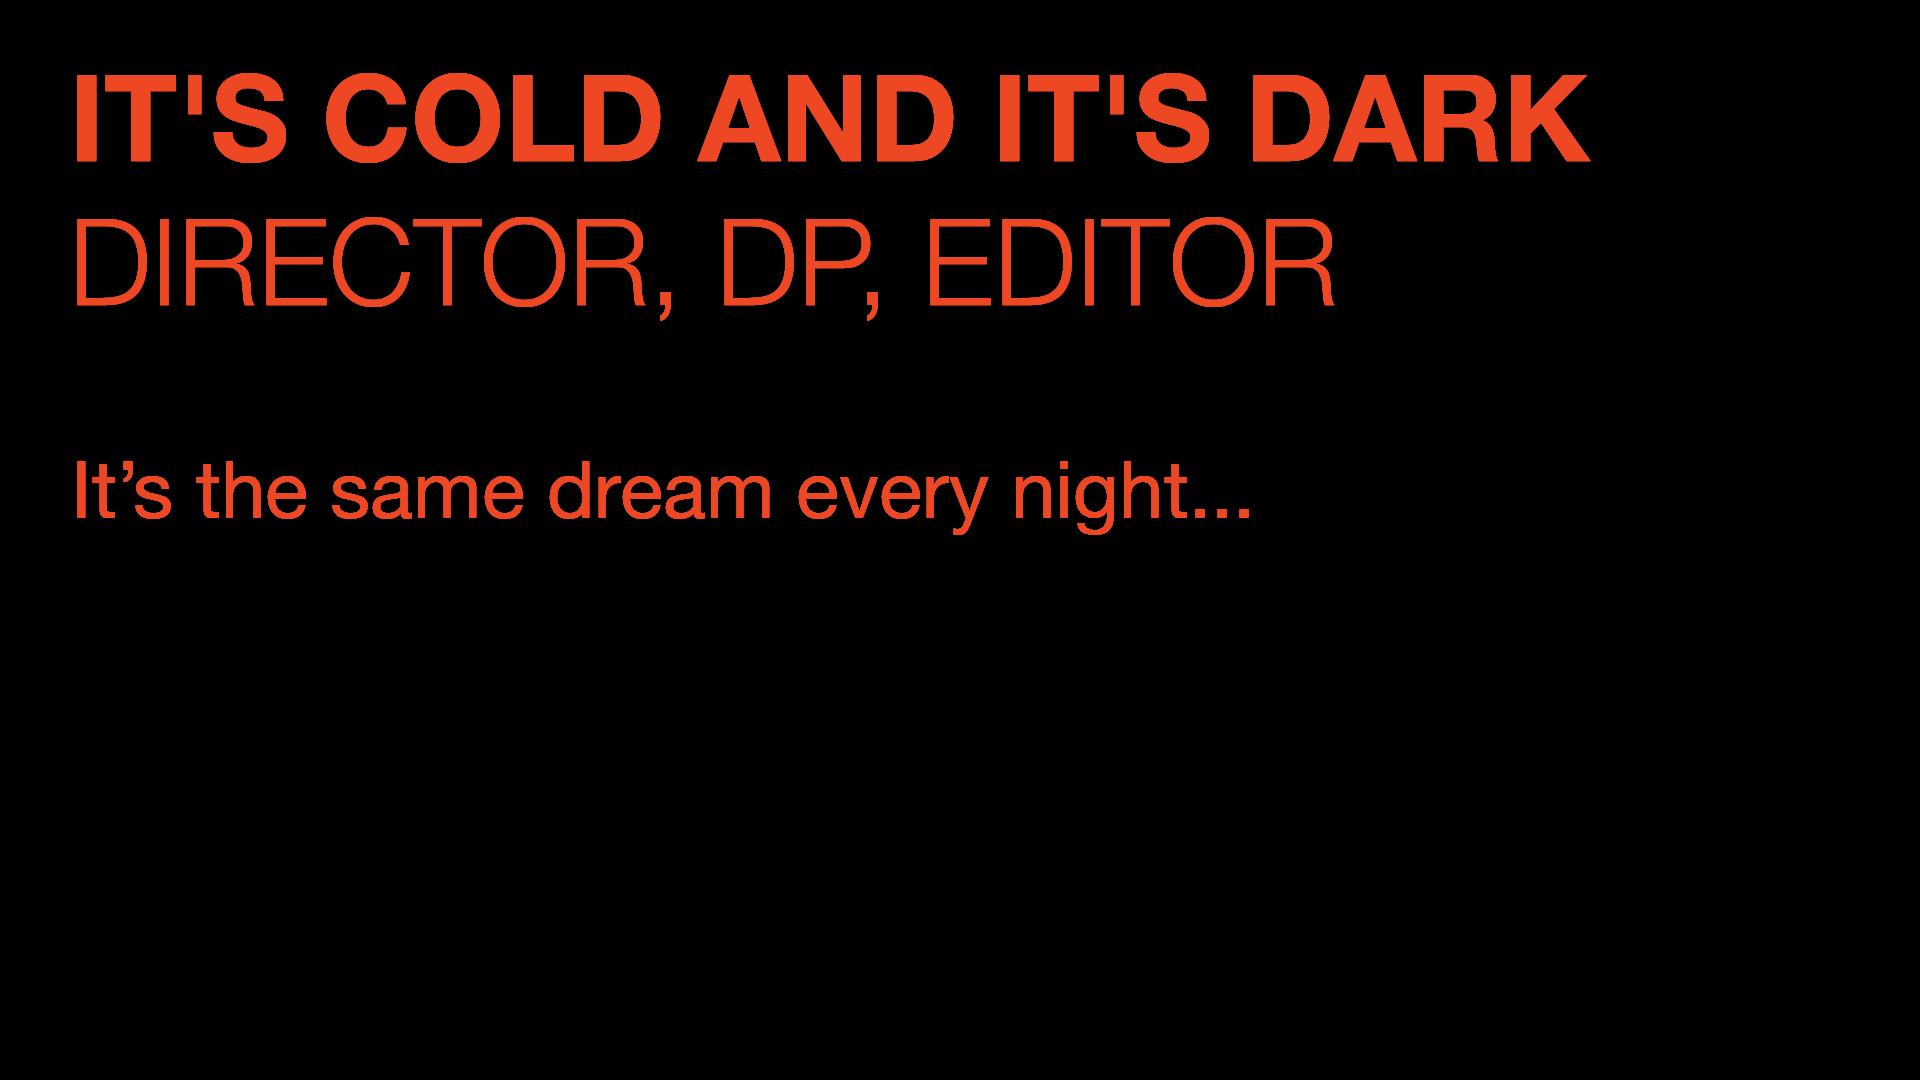 It's Cold and It's Dark Description.png